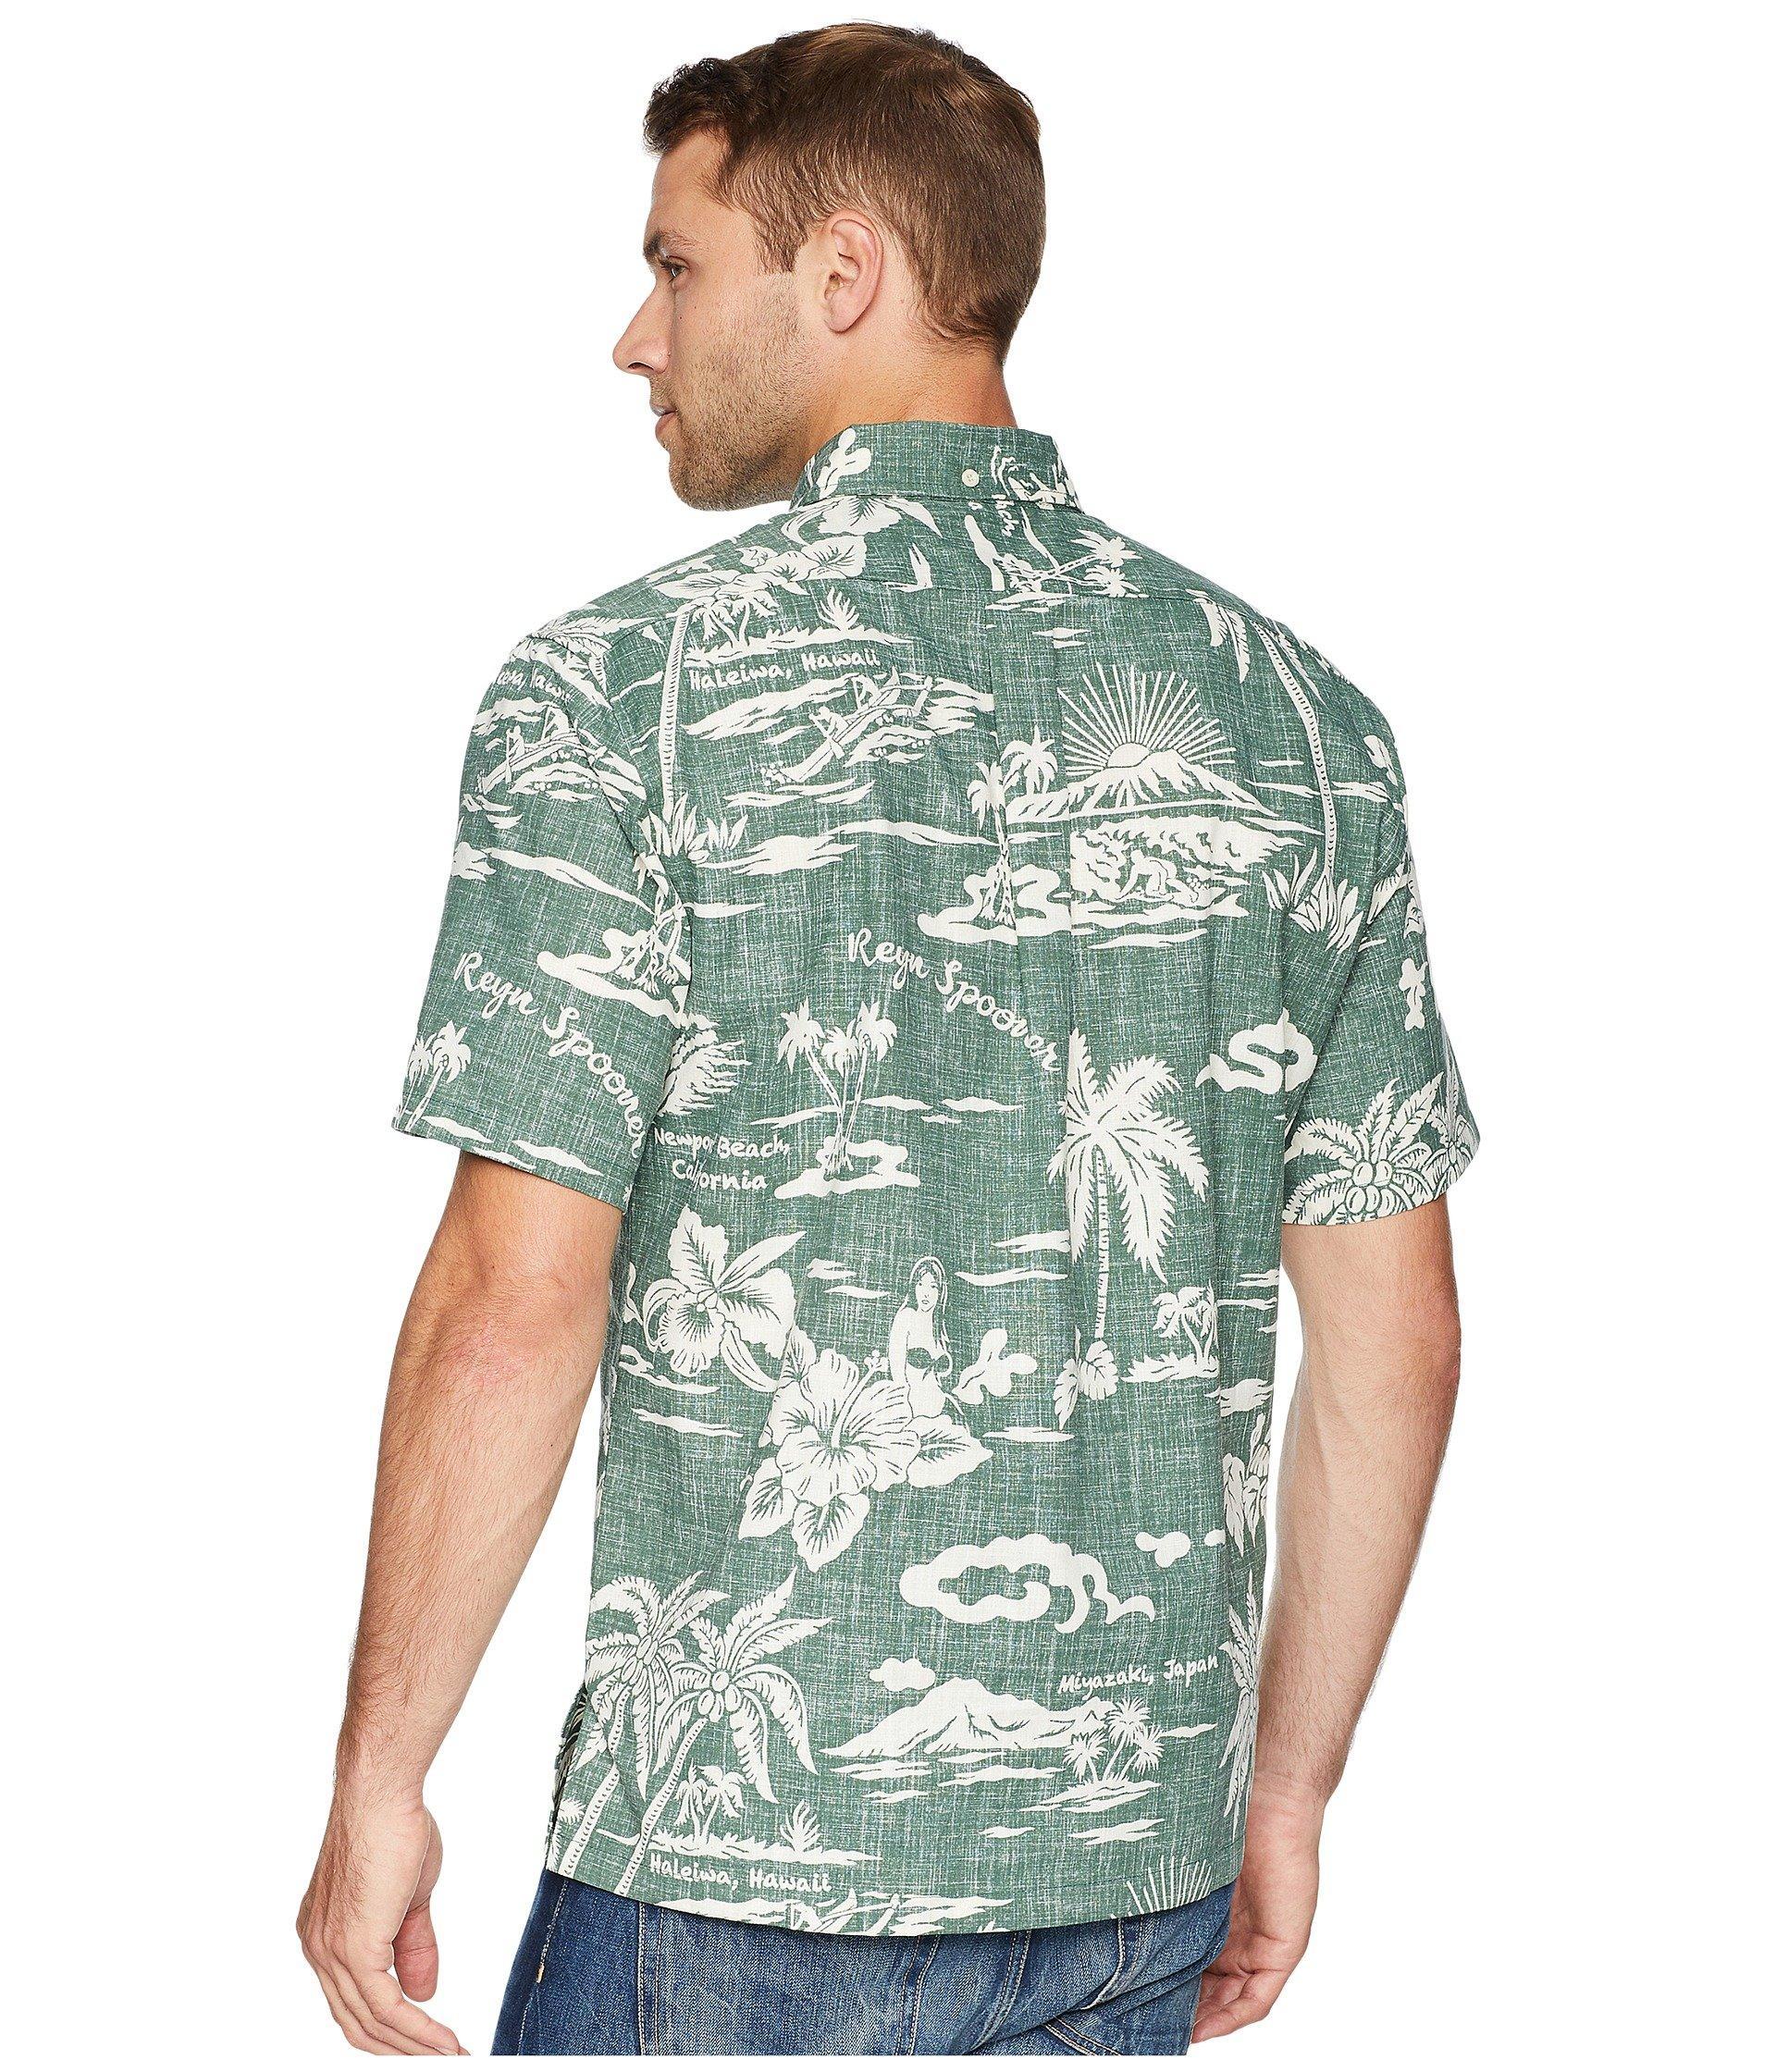 52fe3b21 Reyn Spooner - Green My Private Isle Classic Fit Aloha Shirt for Men -  Lyst. View fullscreen